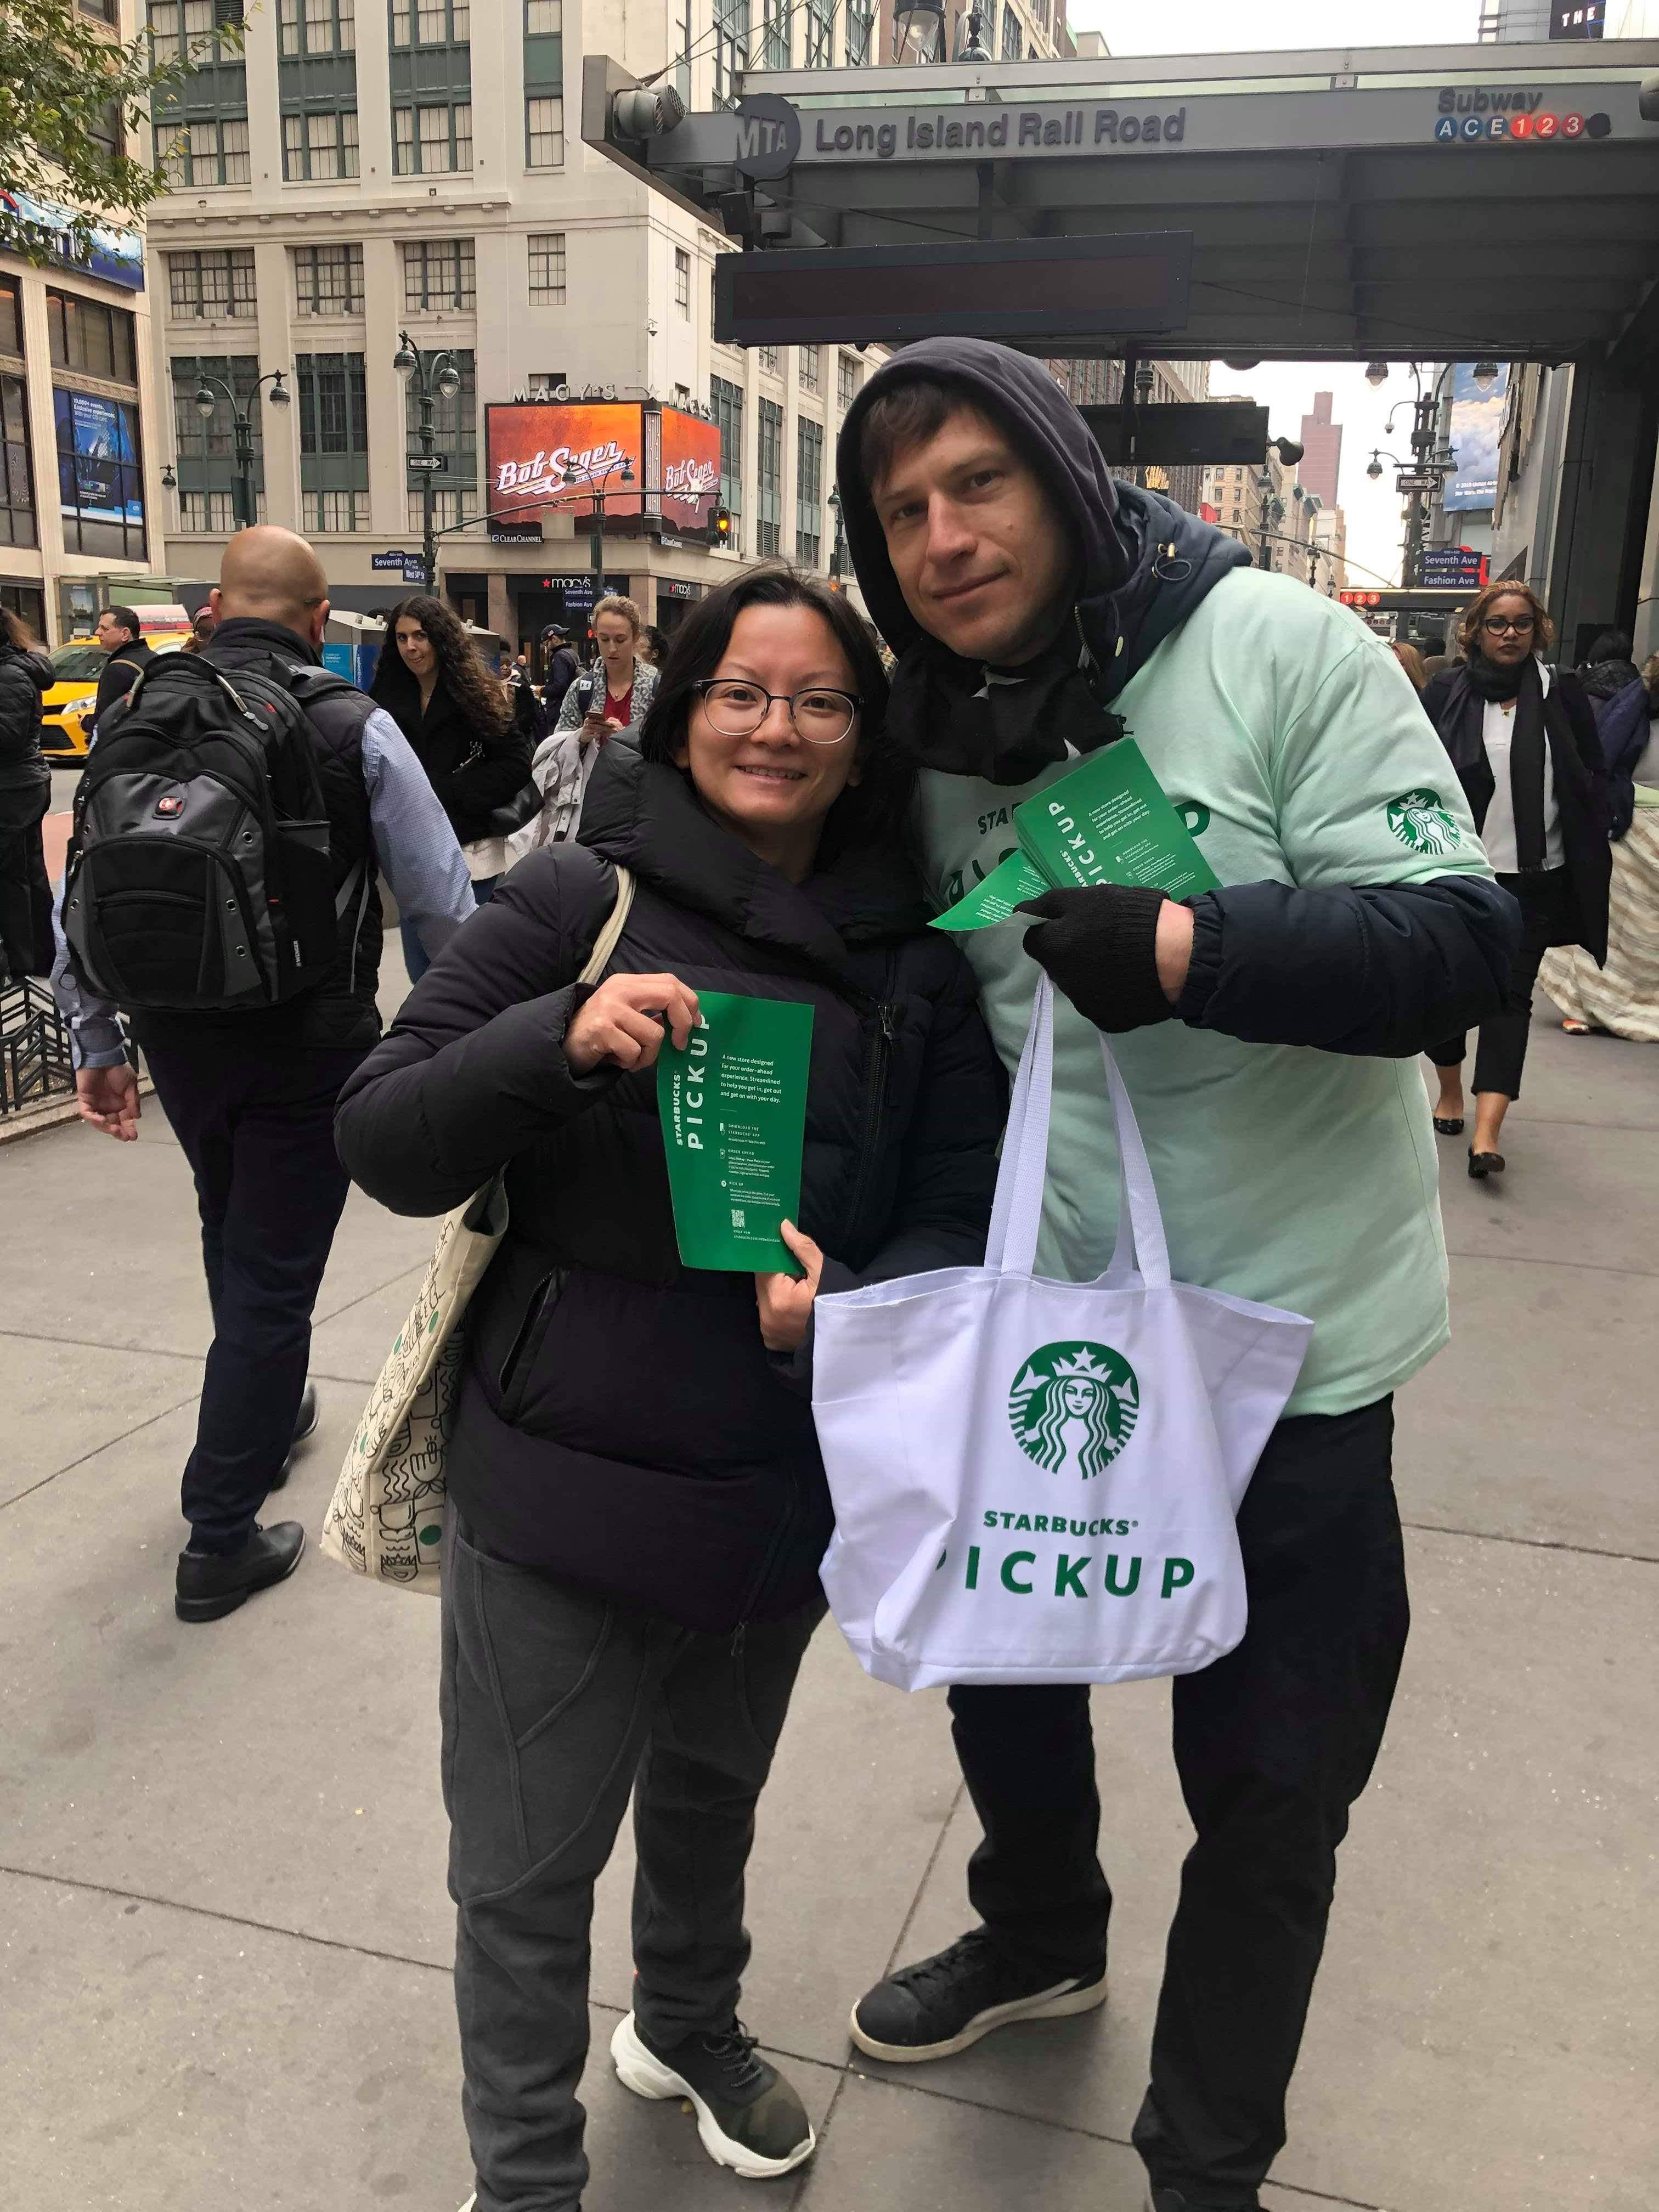 Starbucks brand ambassador teams